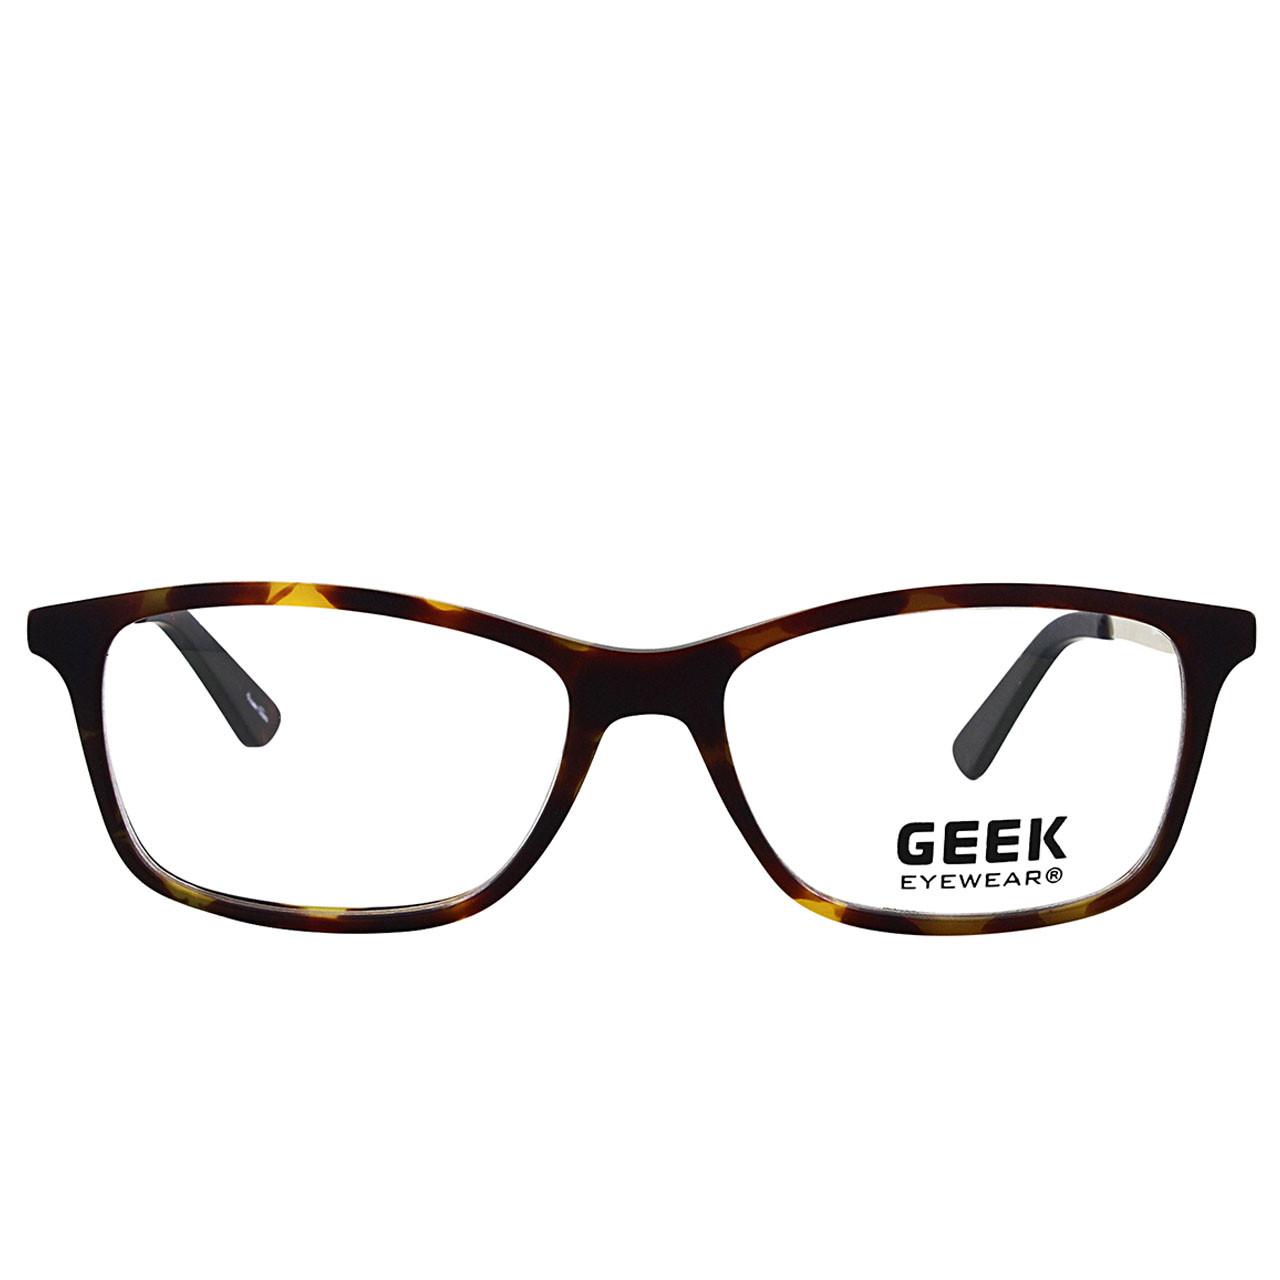 GEEK Eyewear GEEK CRUISER